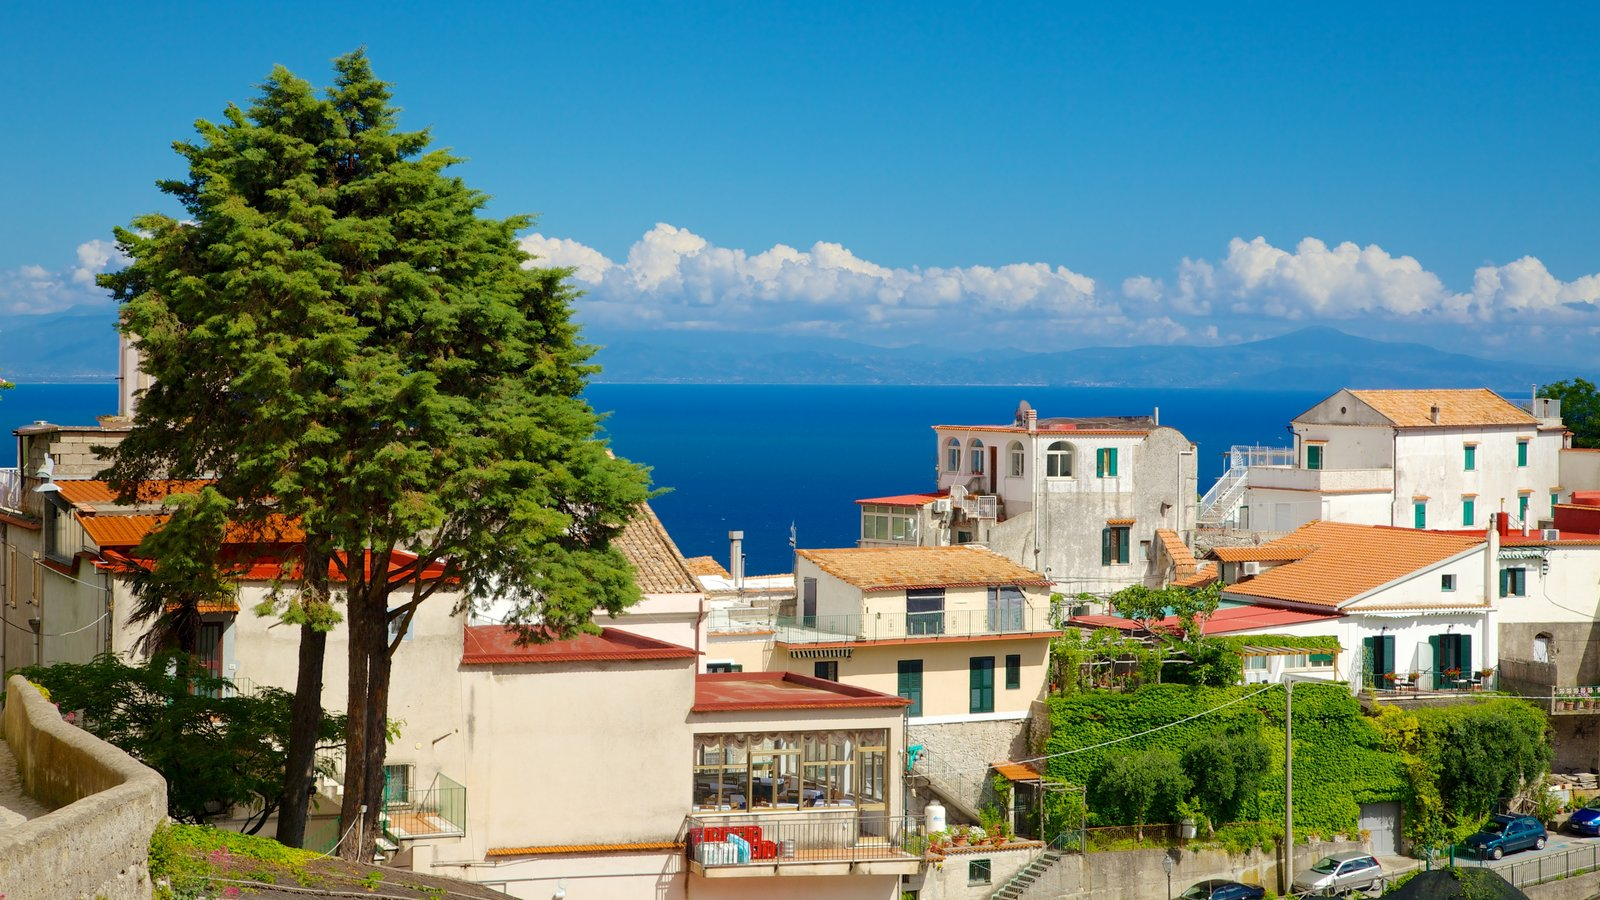 Pontone featuring a coastal town and general coastal views